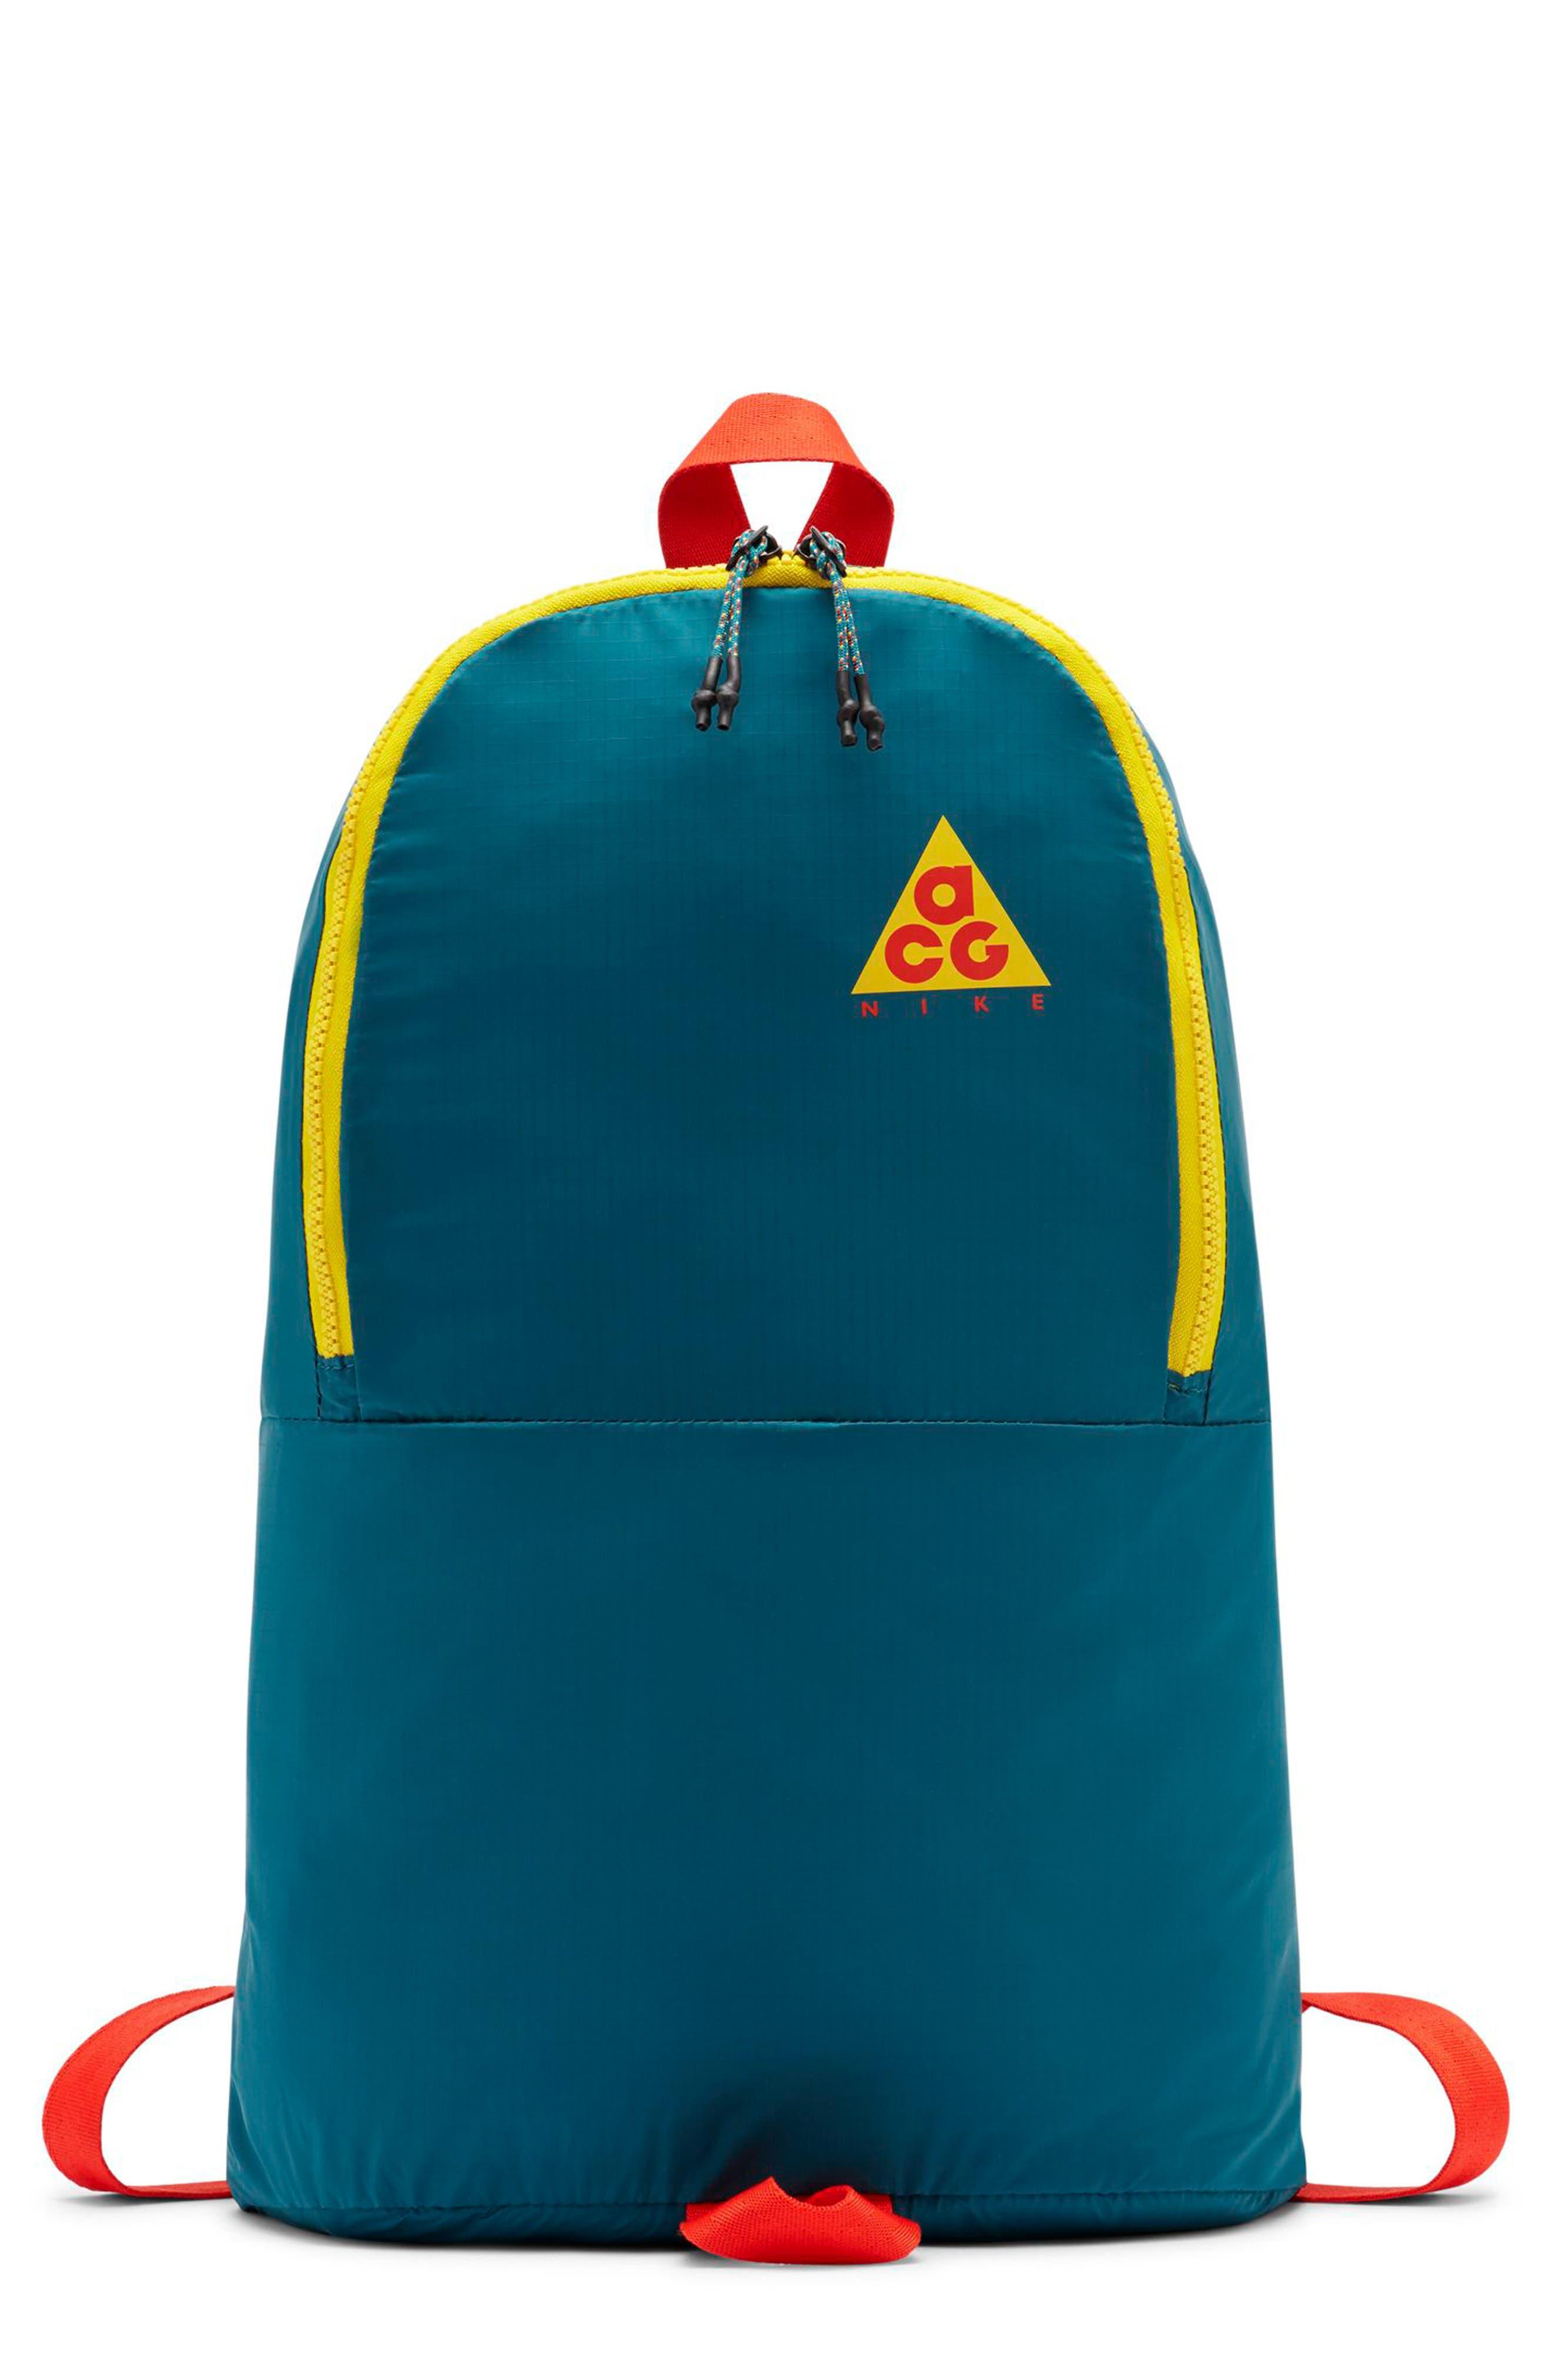 ACG Packable Backpack,                         Main,                         color, GEODE TEAL/ GEODE TEAL